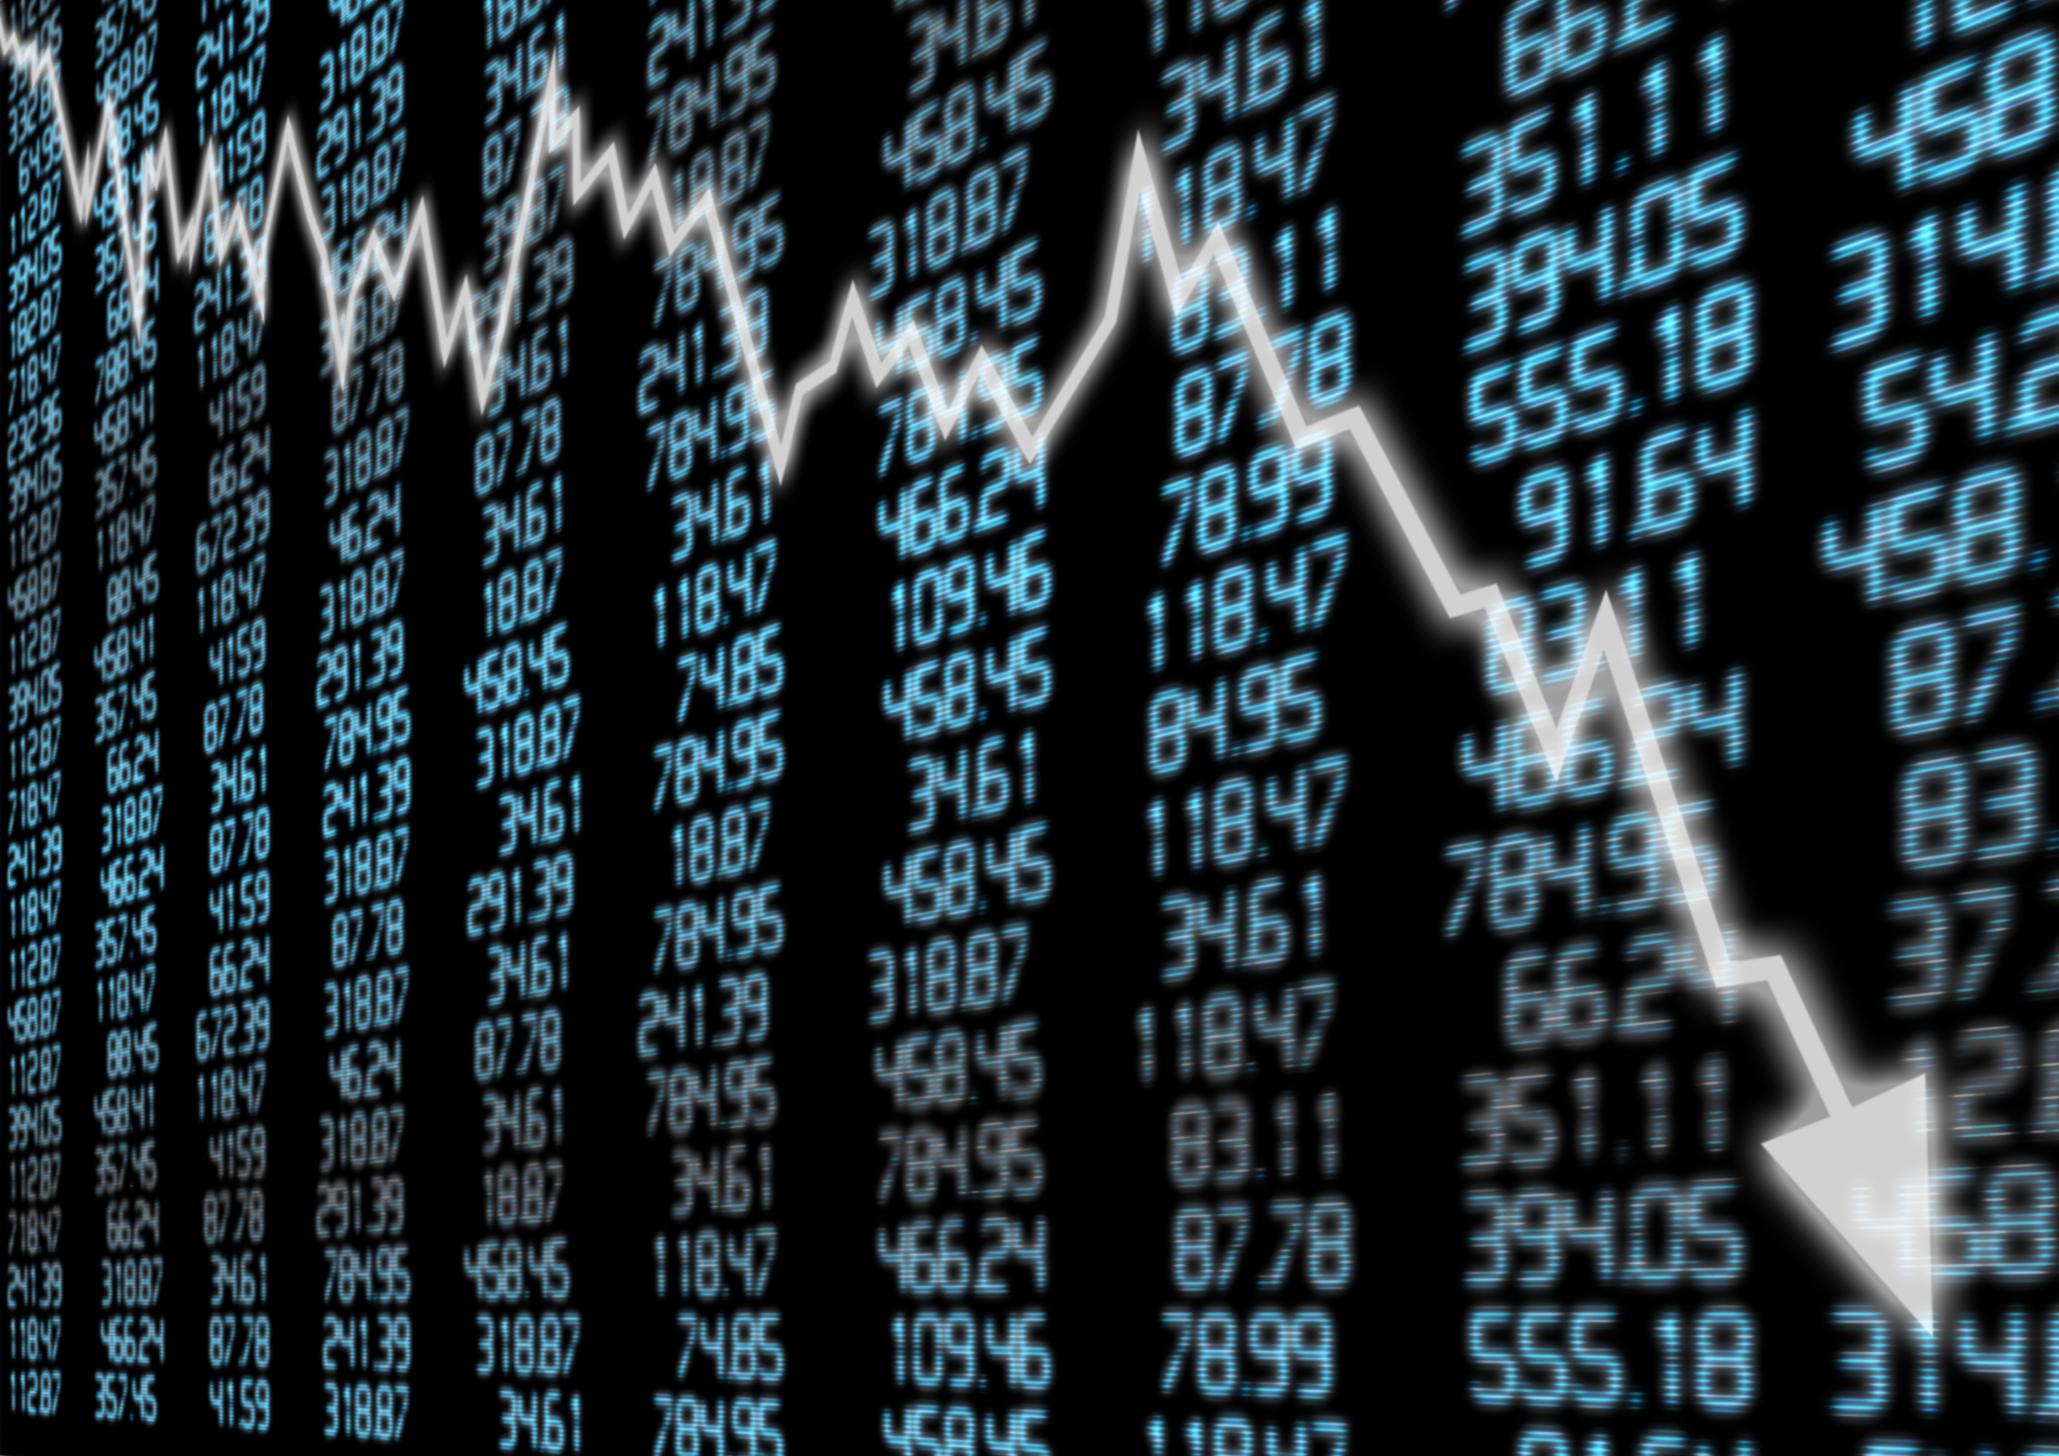 Why Impinj Stock Slumped Today